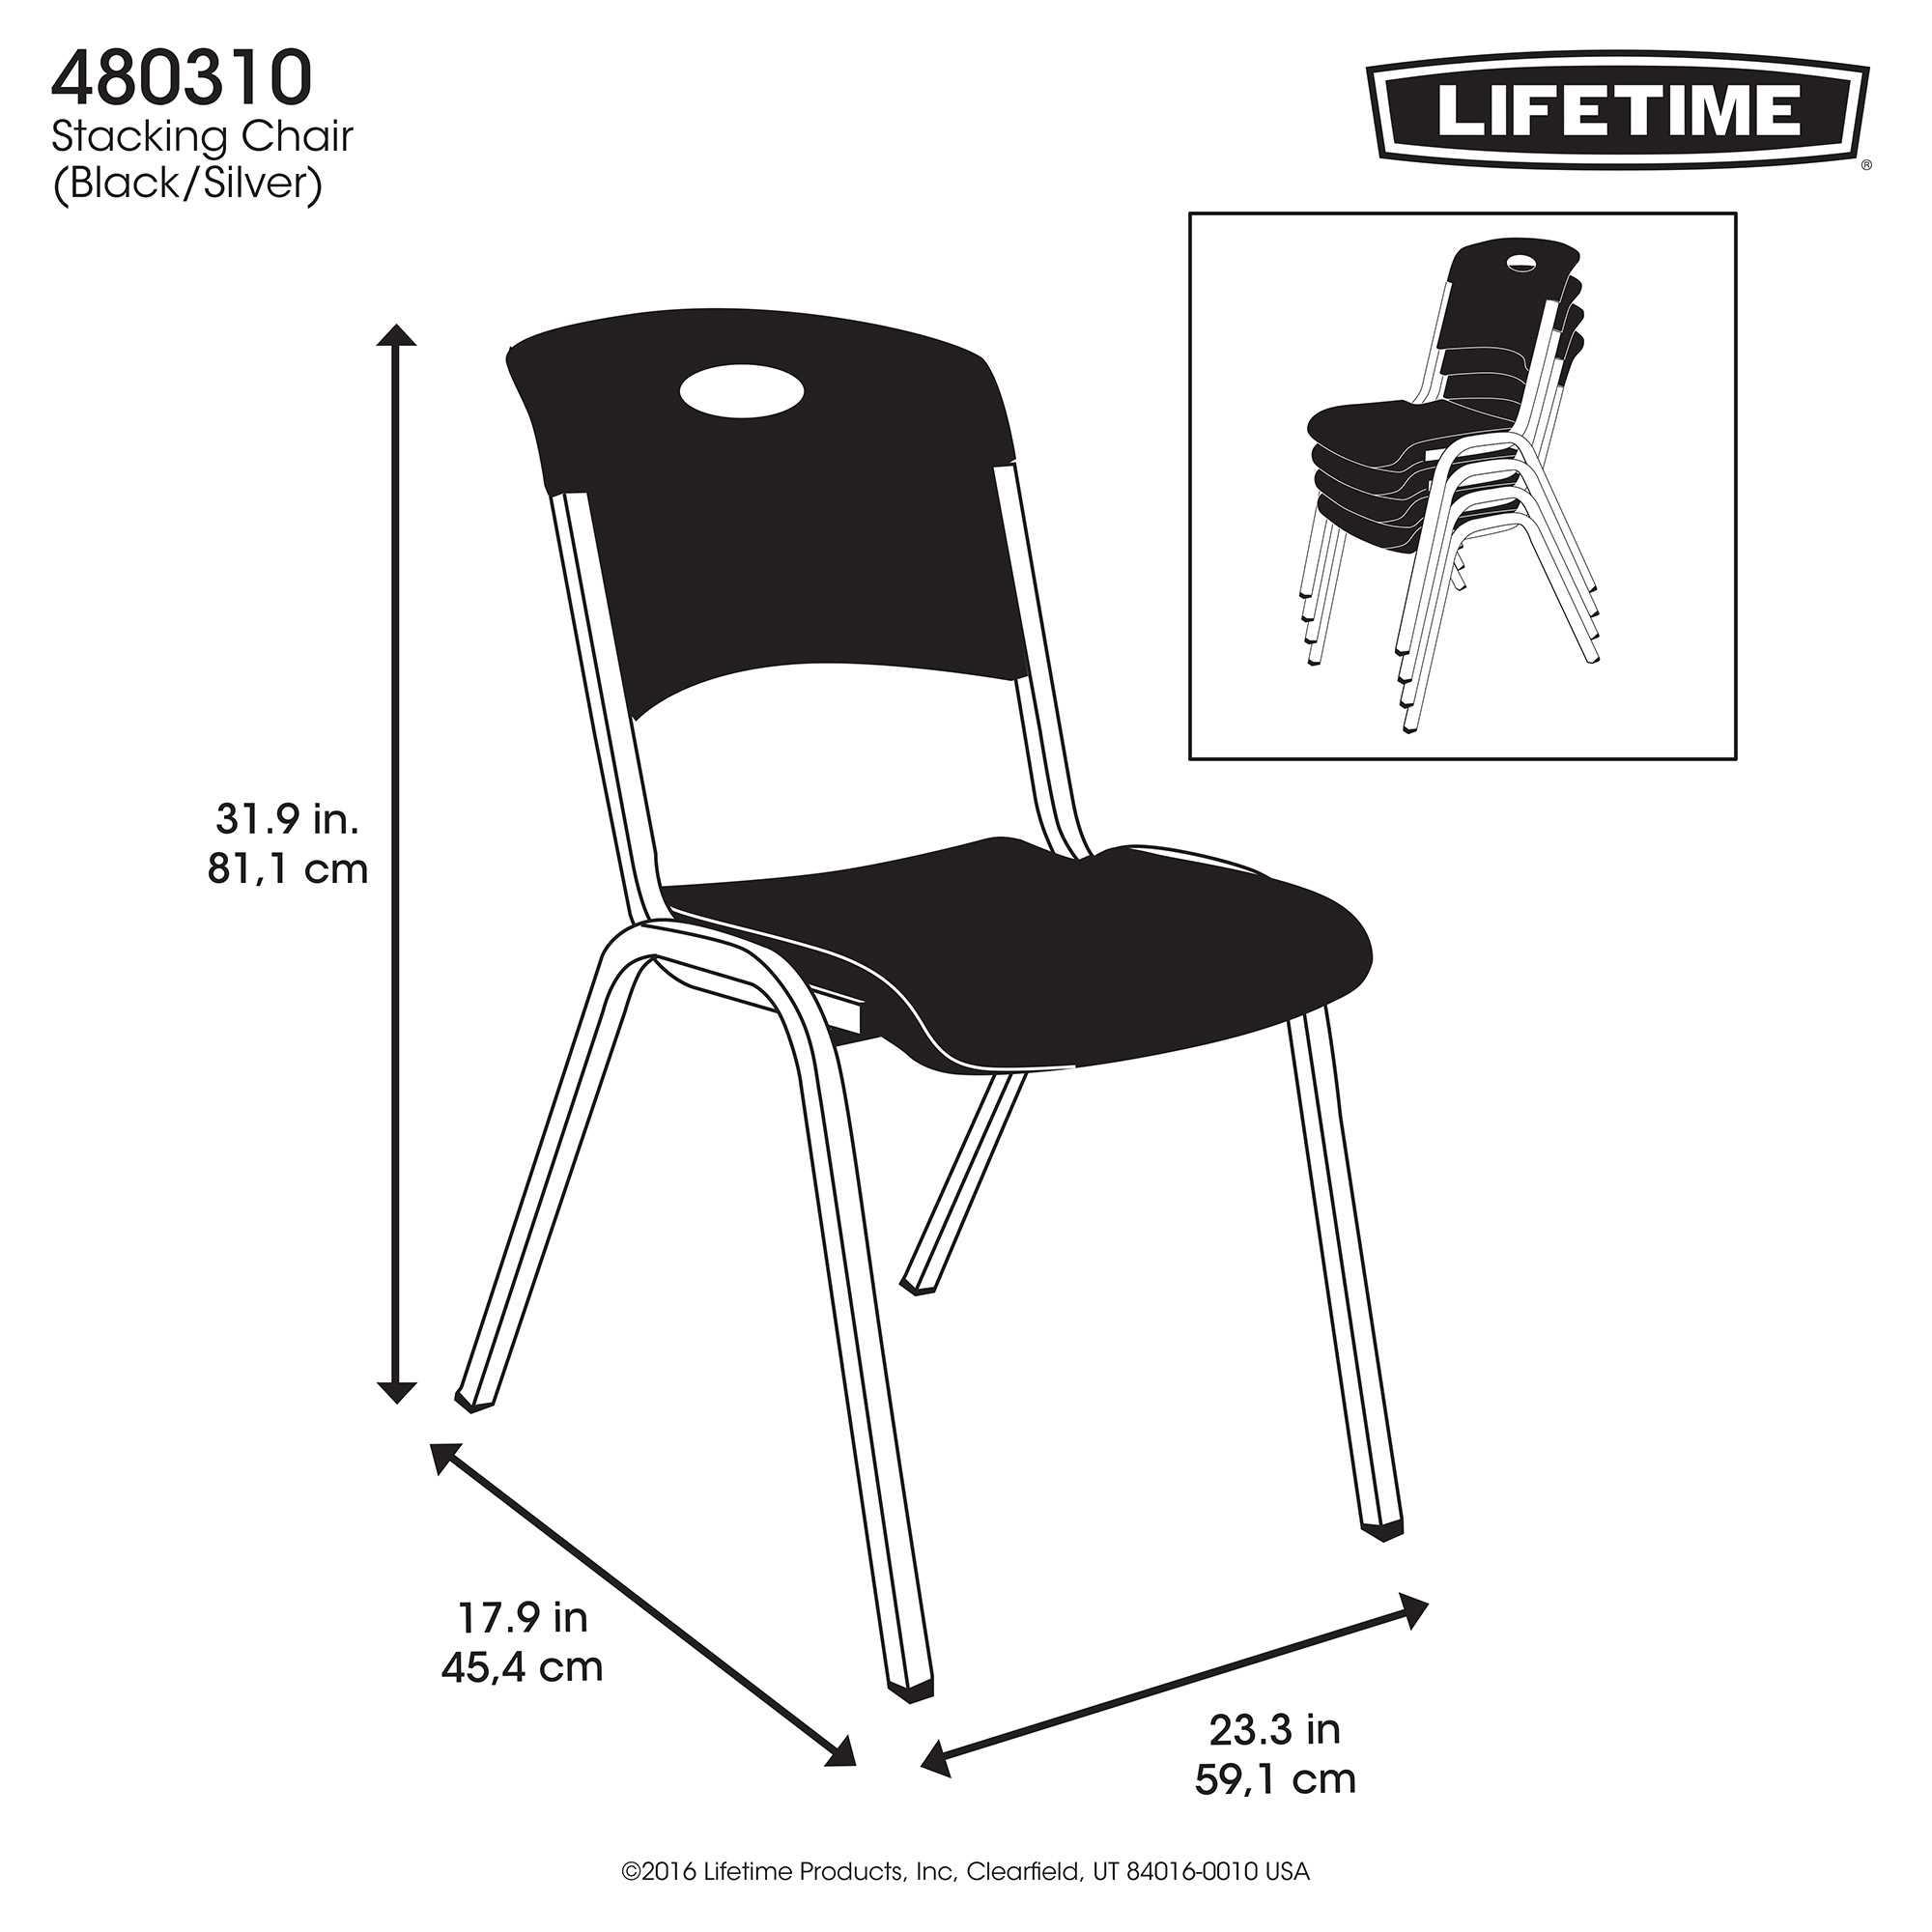 Lifetime Premium Black Stacking Chair 80310